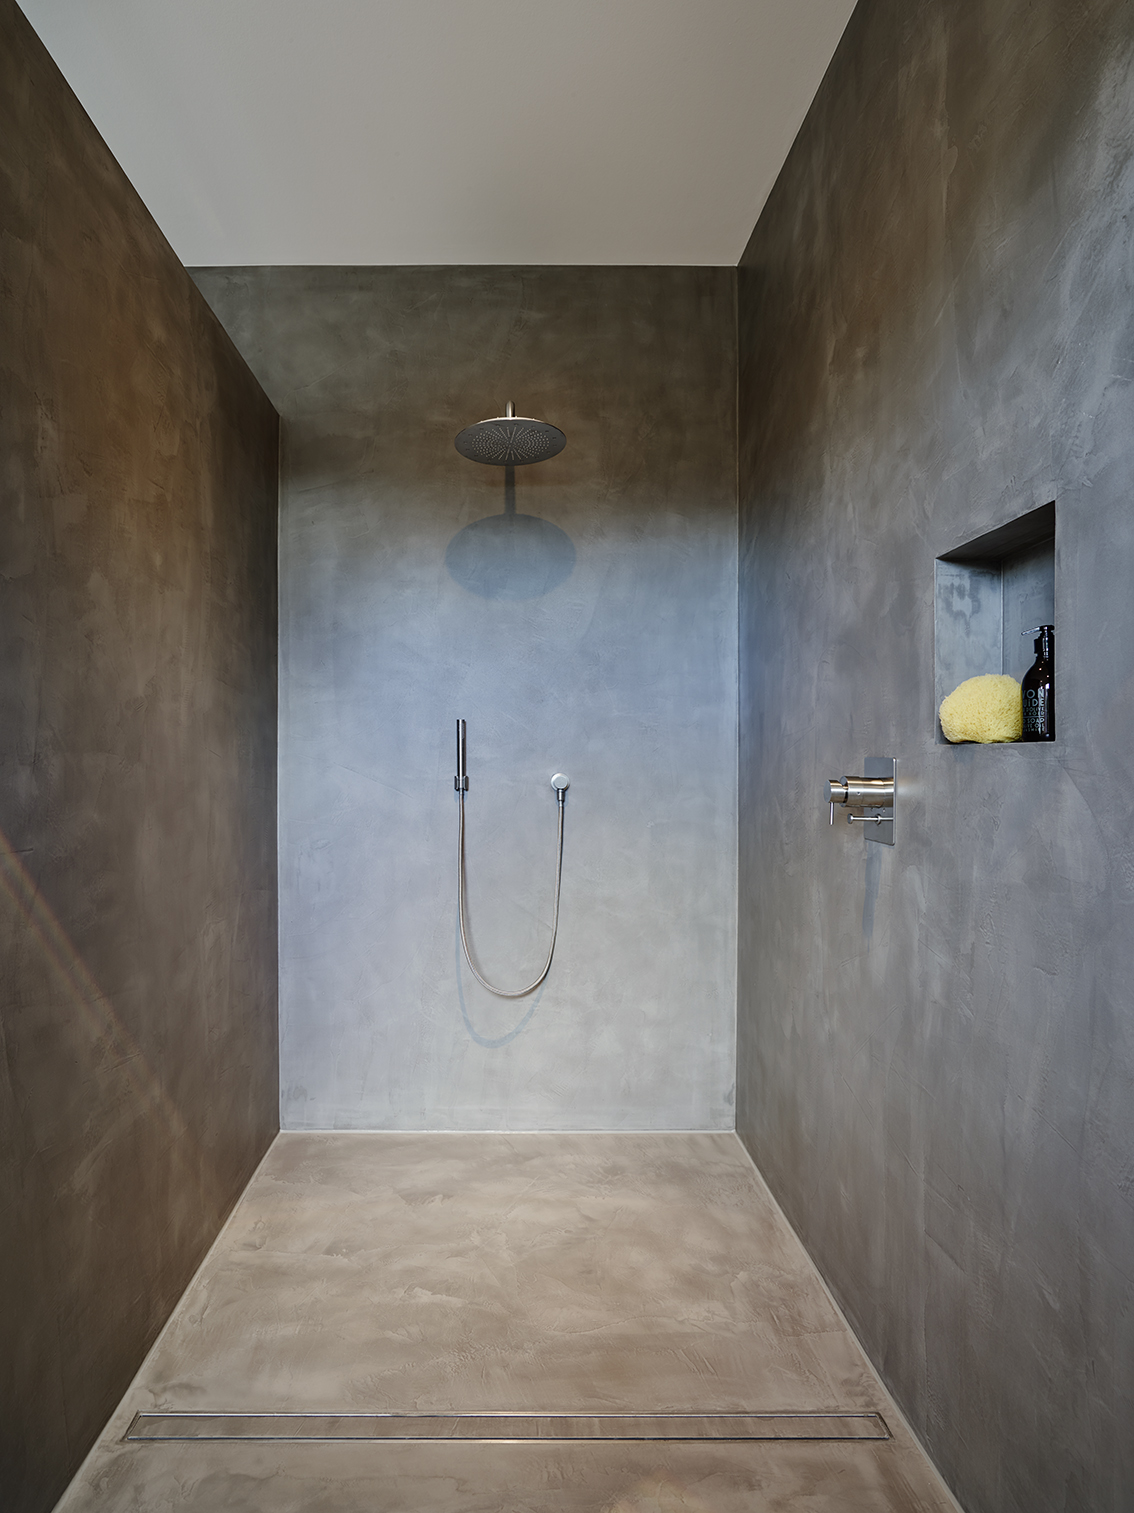 innenarchitektur badplanung bad interior design. Black Bedroom Furniture Sets. Home Design Ideas